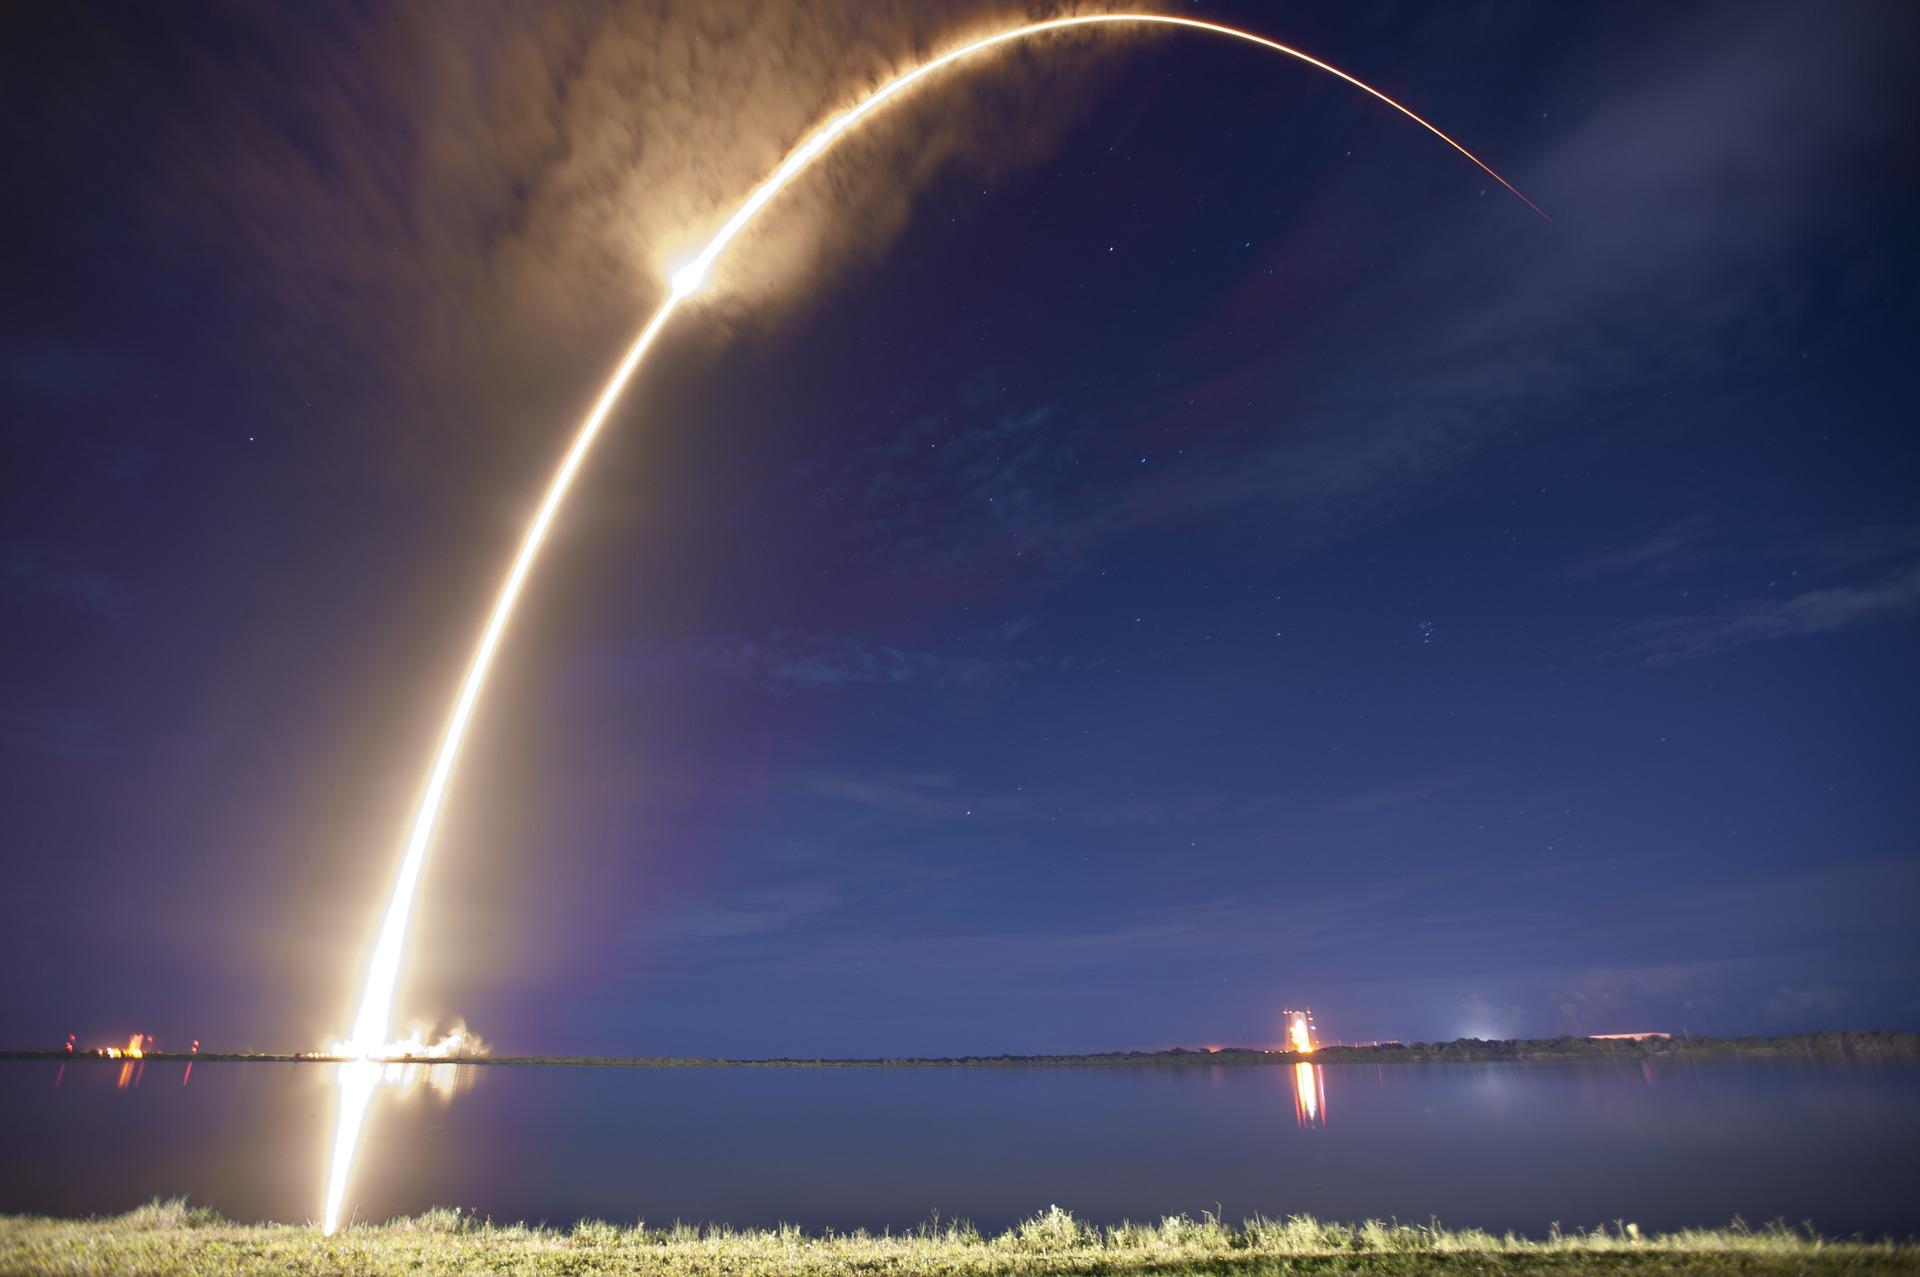 missile in flight